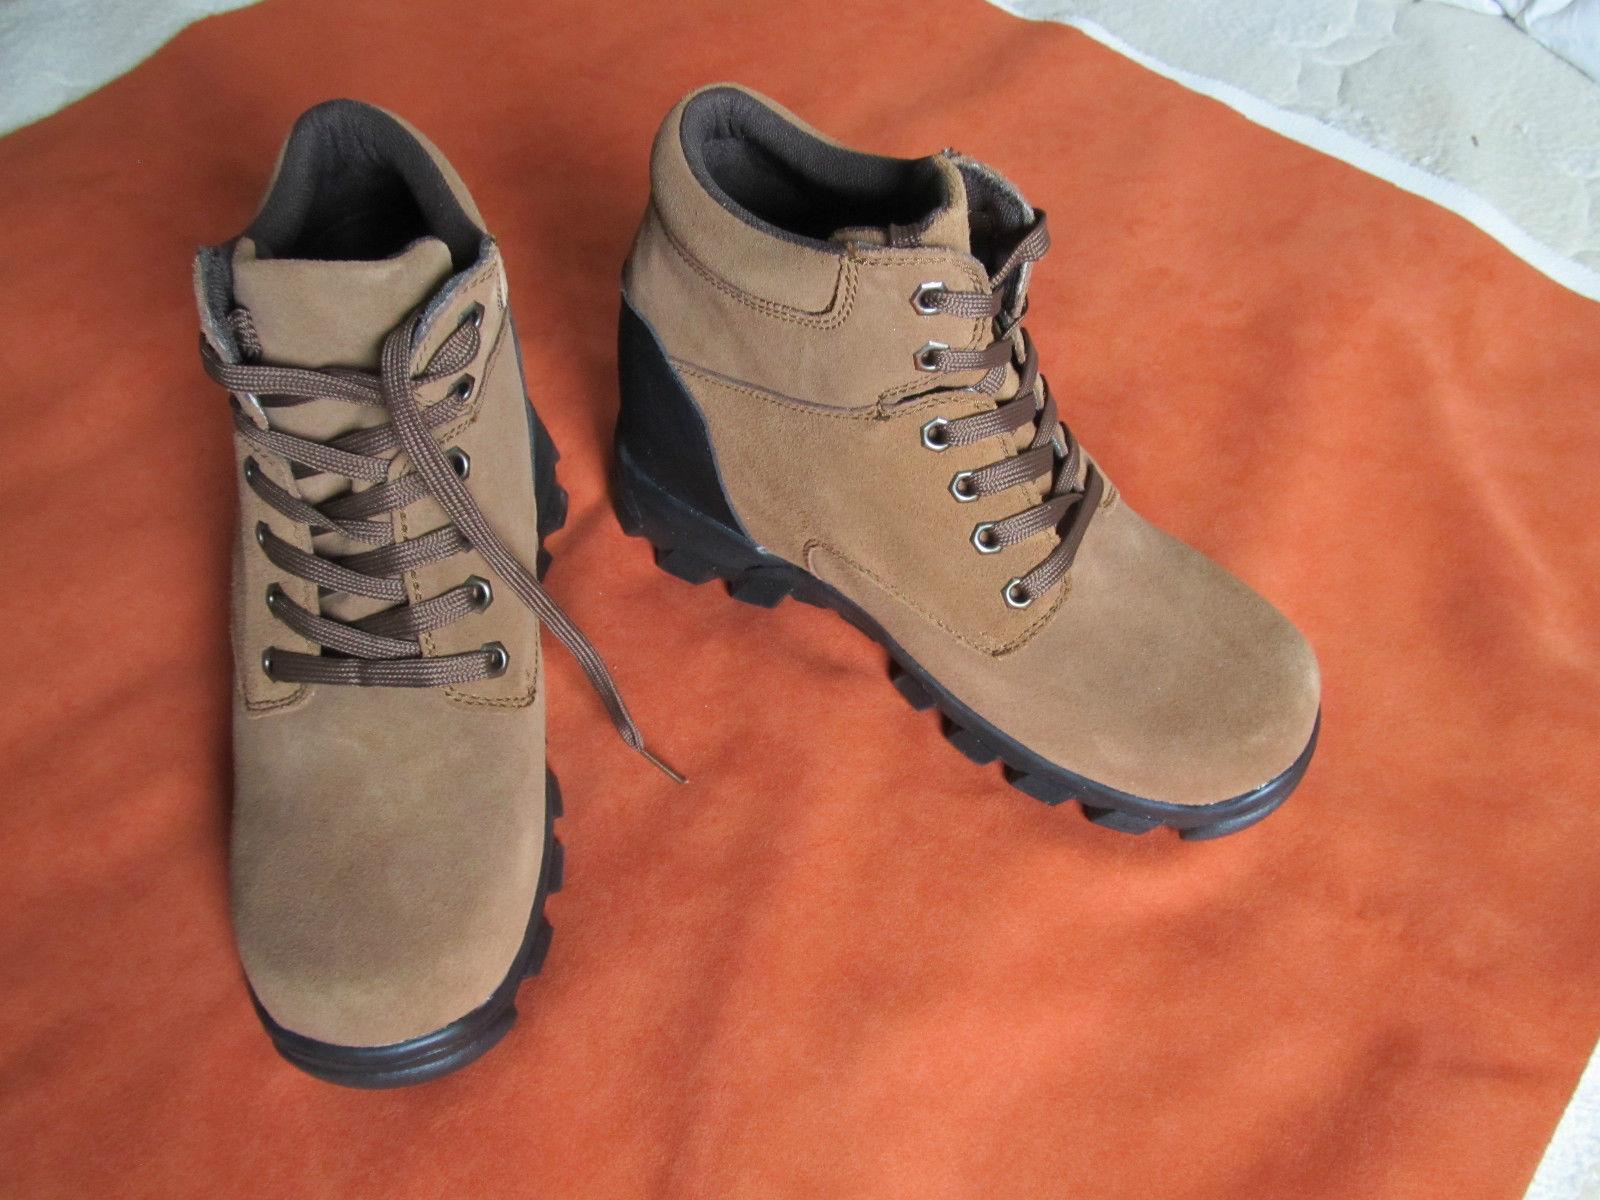 Herren Schuhe Größe 41 (40,5)-ca.10cm -unsichtbarer Absatz ! Plateau , Bertulli